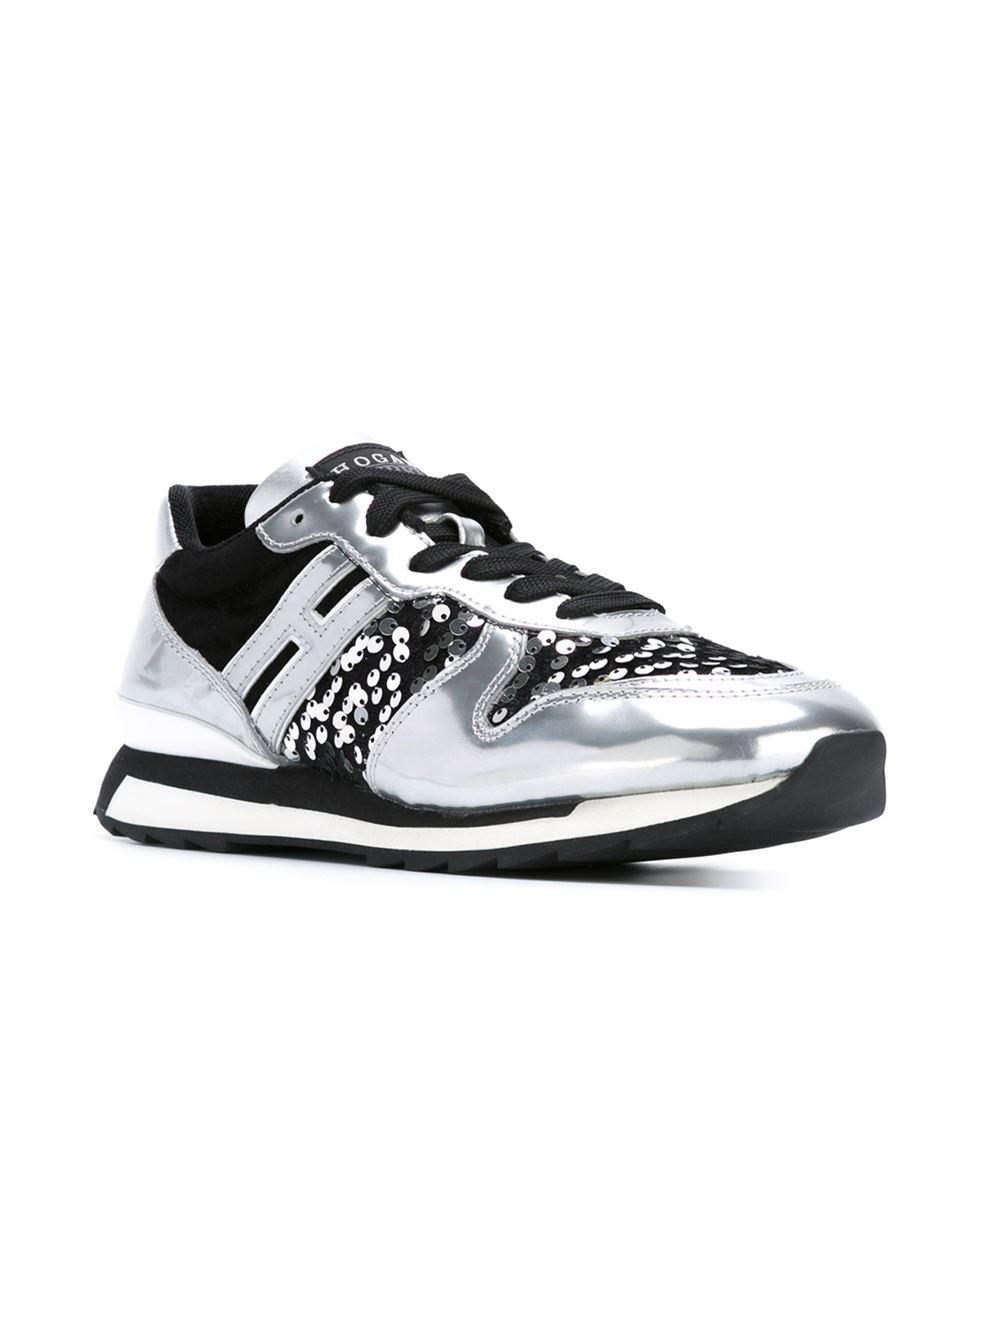 Hogan R261 Sneakers